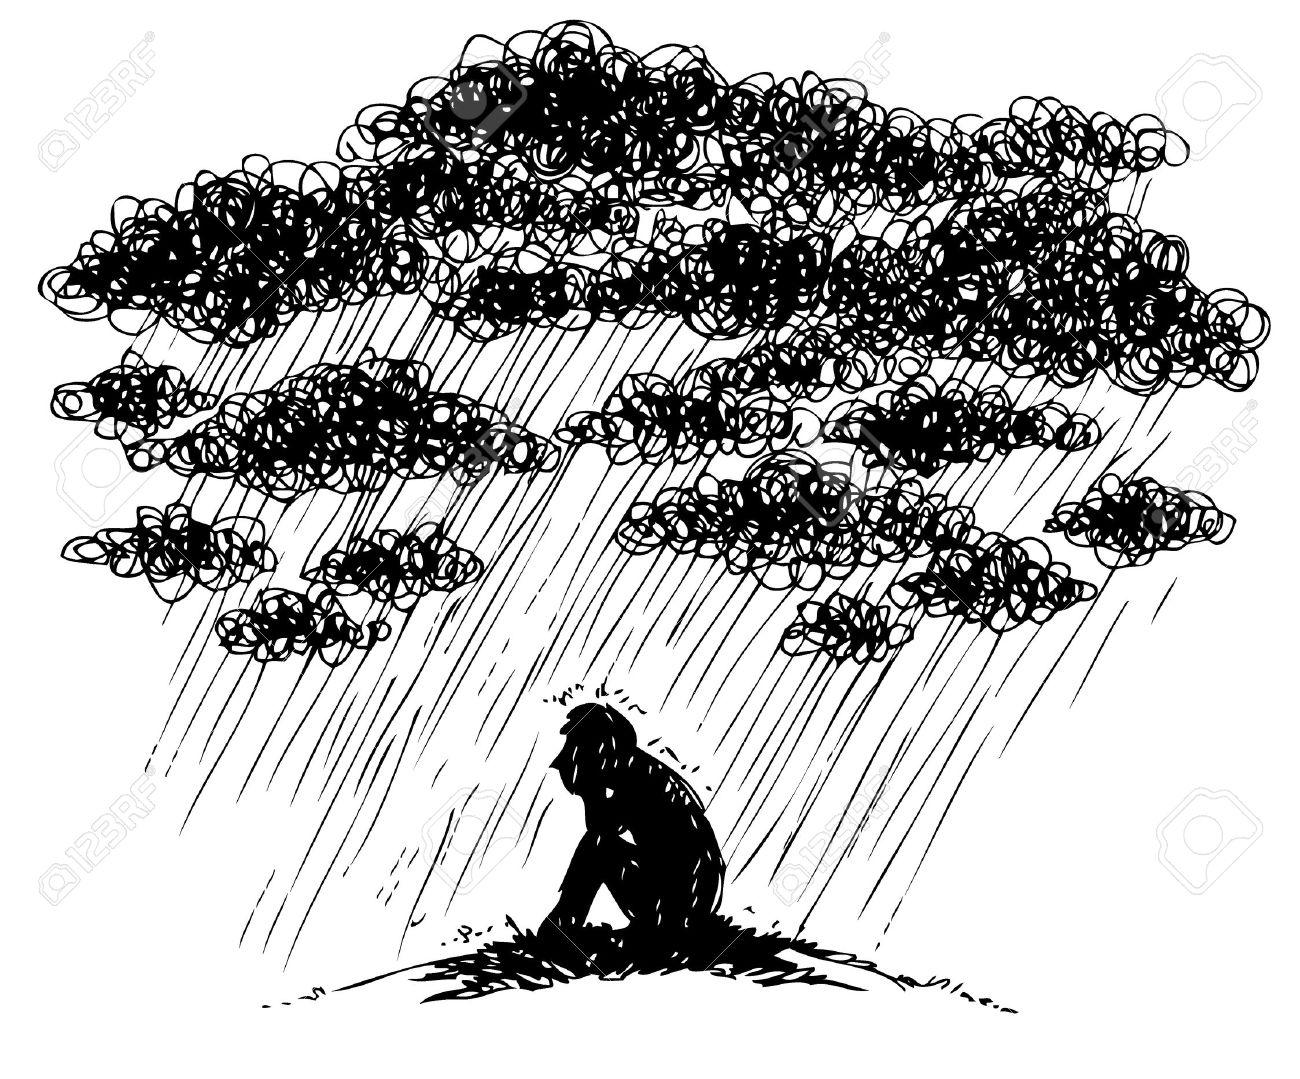 Sad man under a stromy rain, sketchy illustration - 23660490